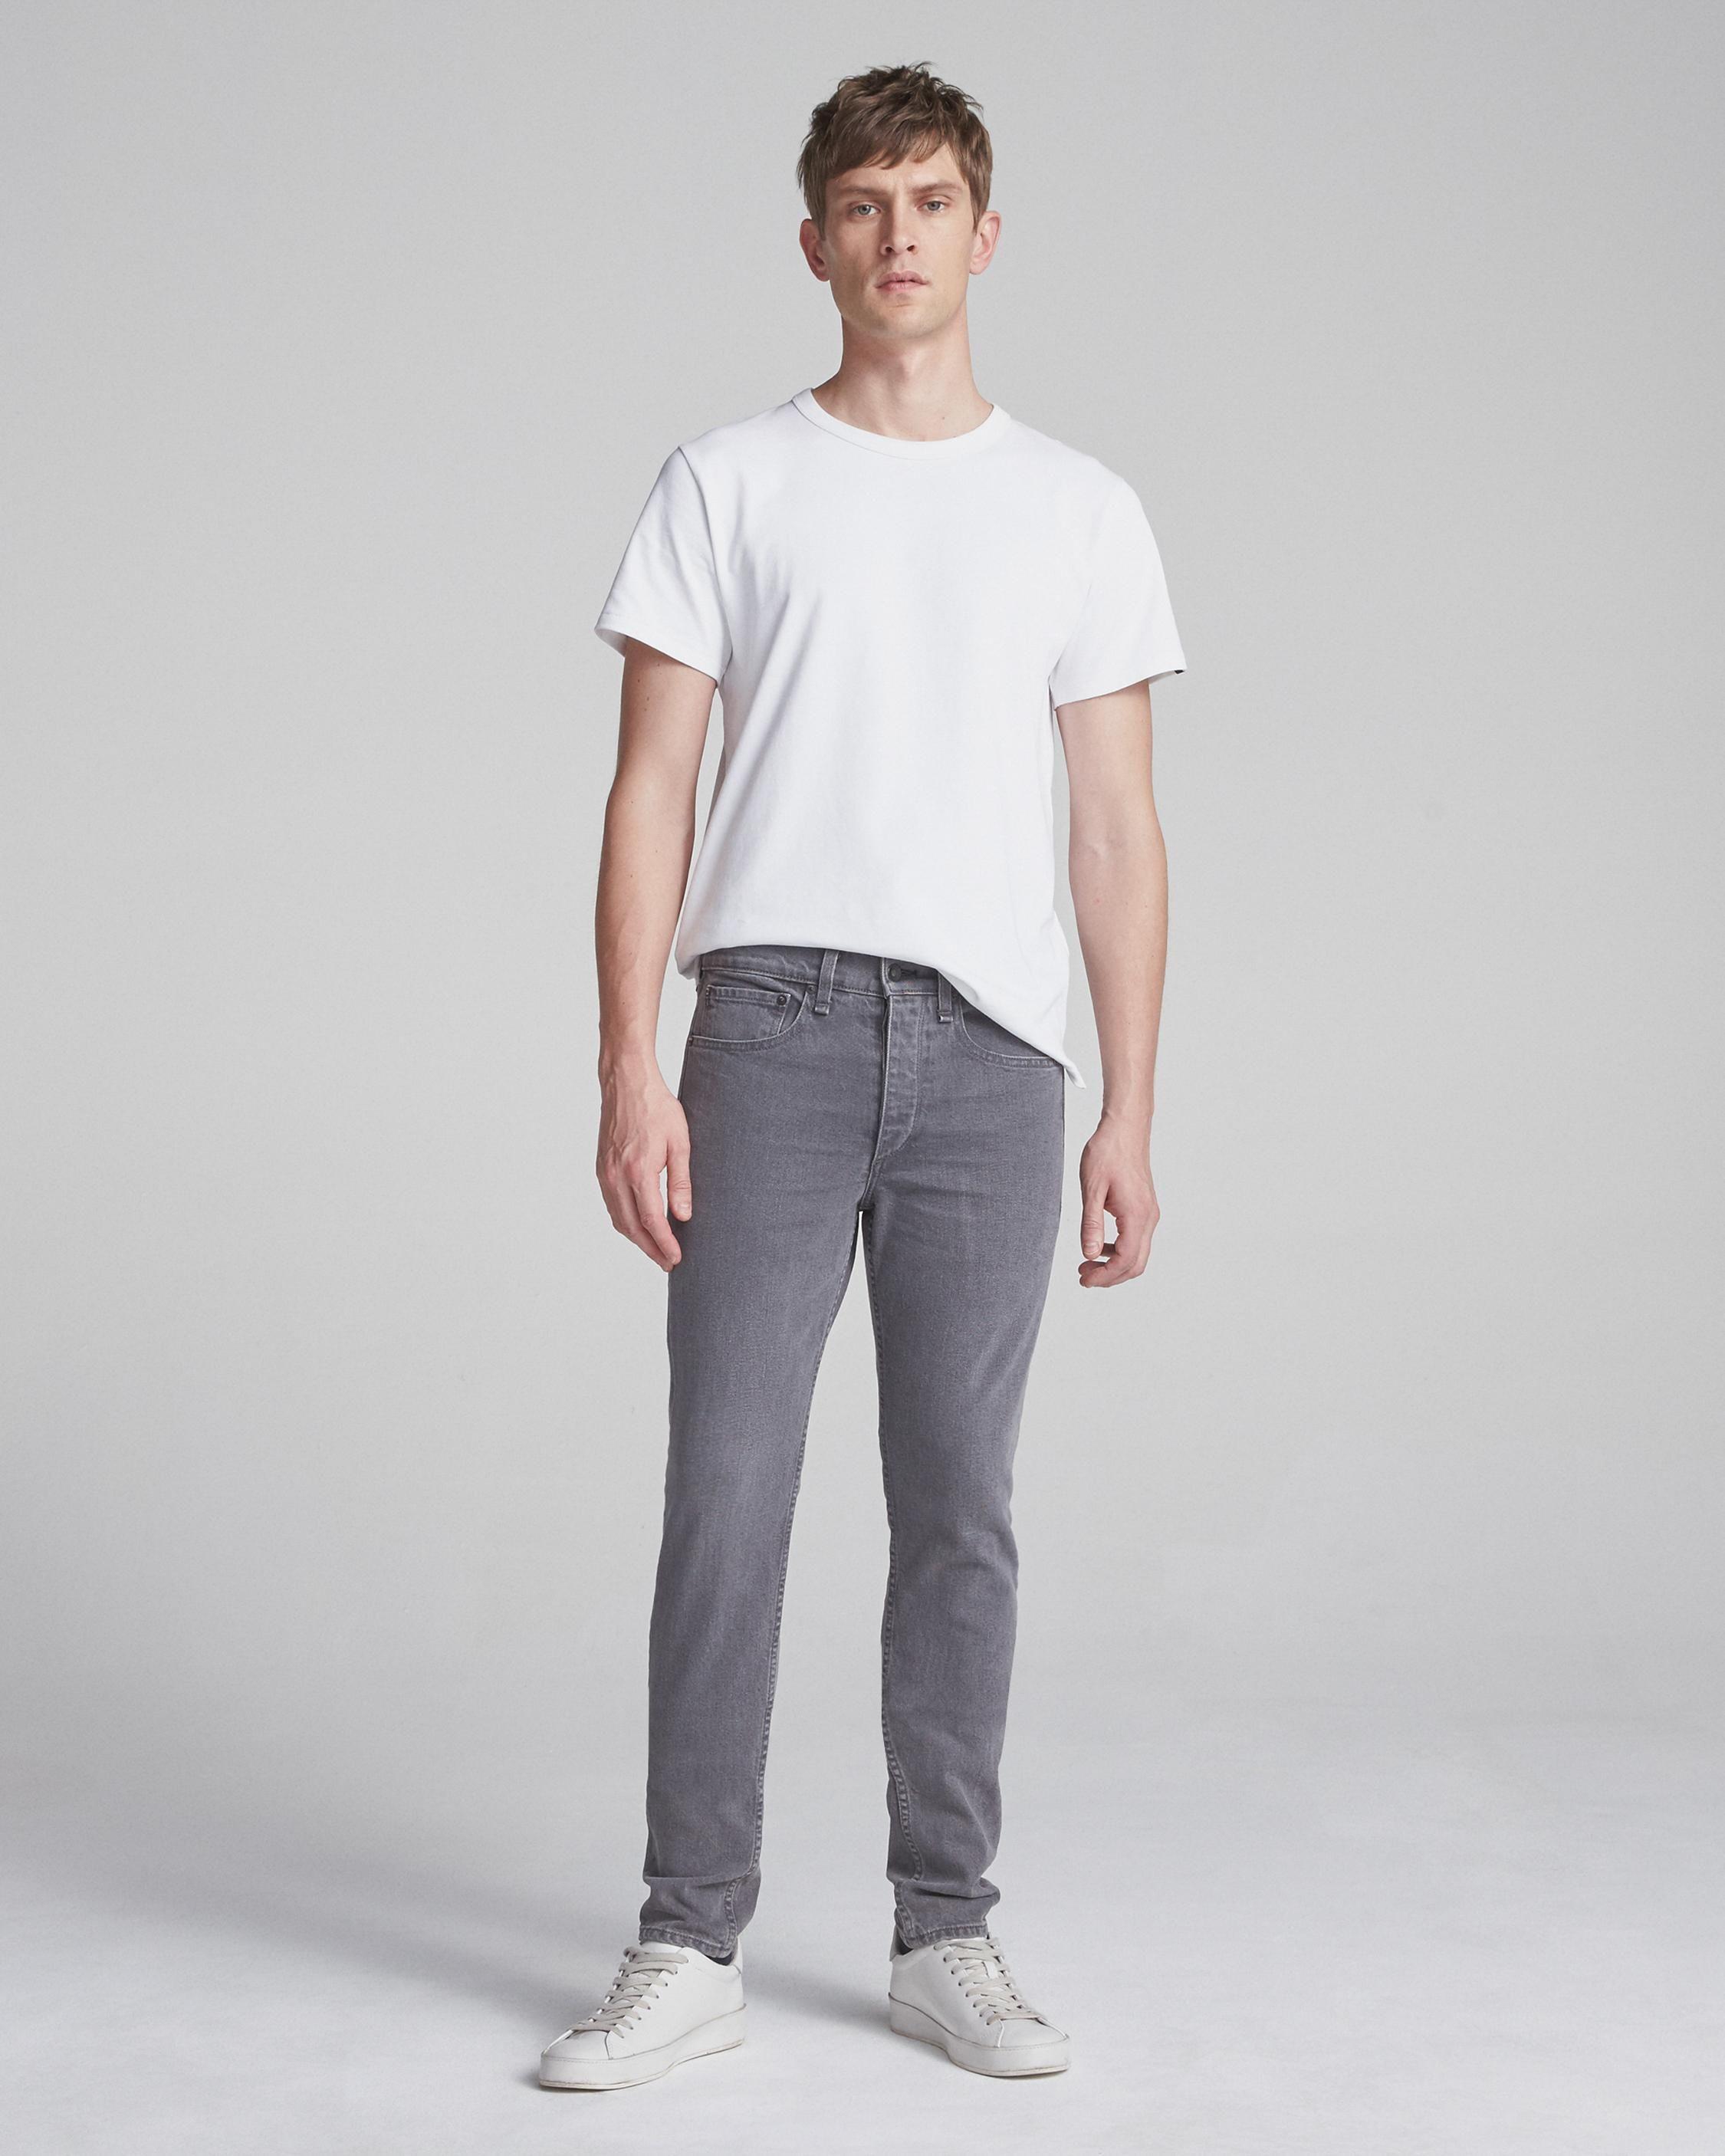 fit 1 skinny fit jean mens